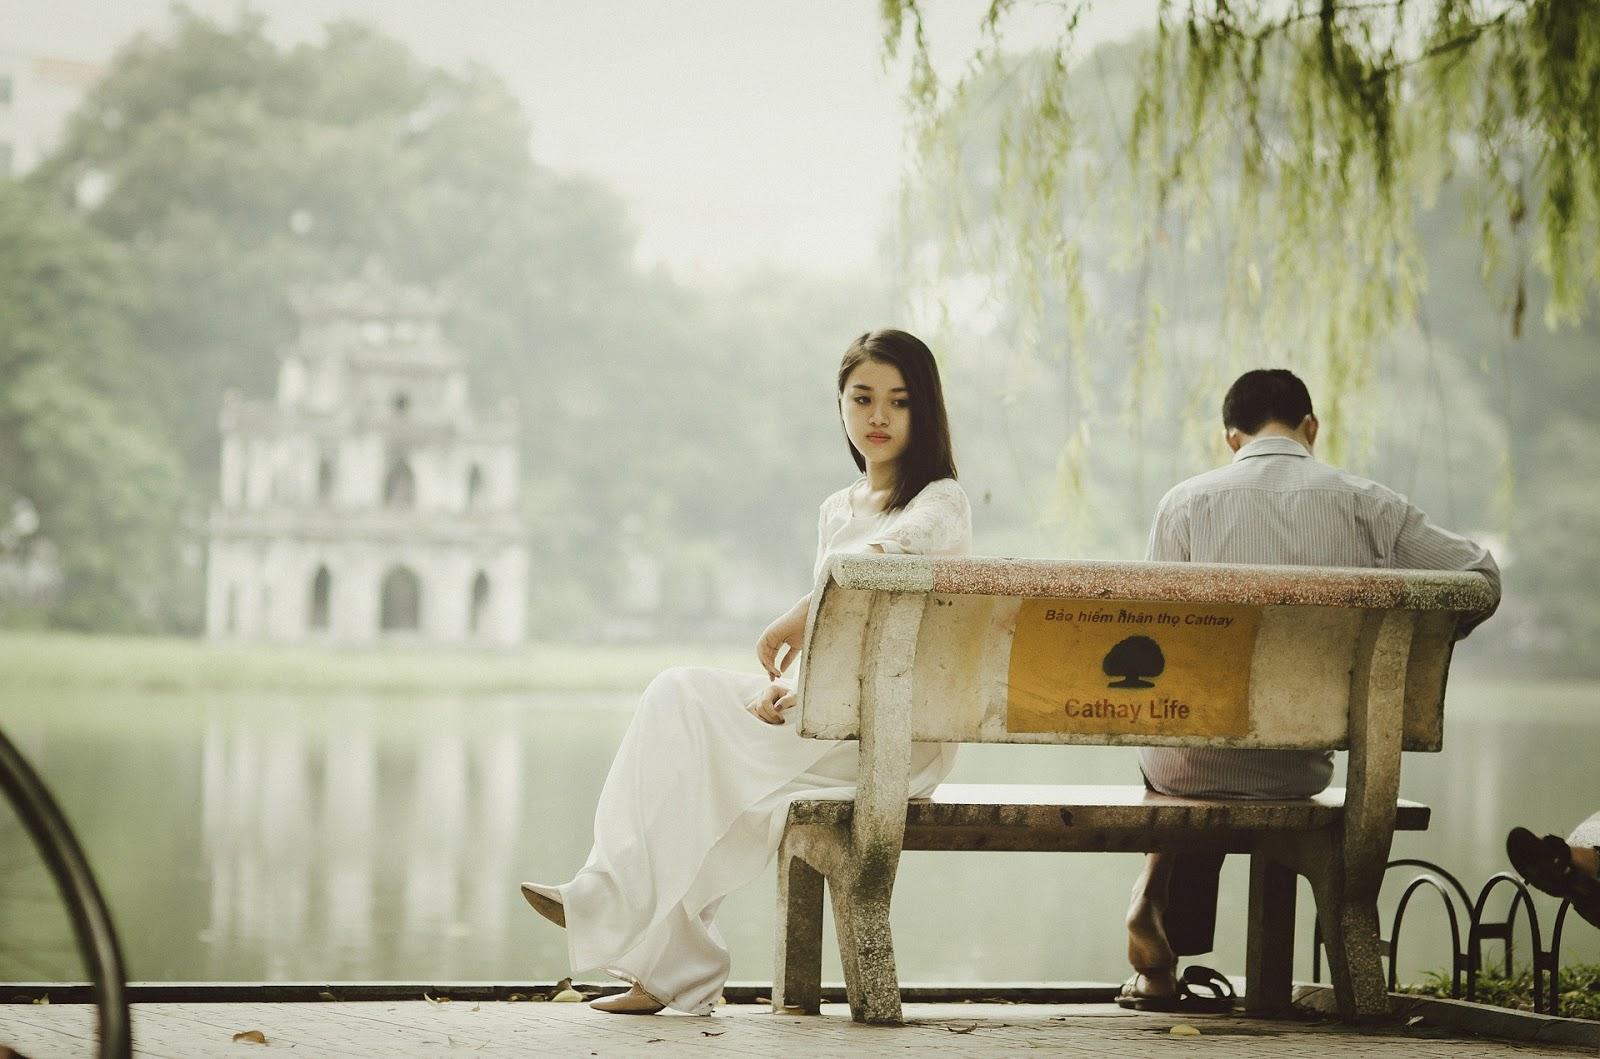 32 Sad Love Quotes and WhatsApp Status